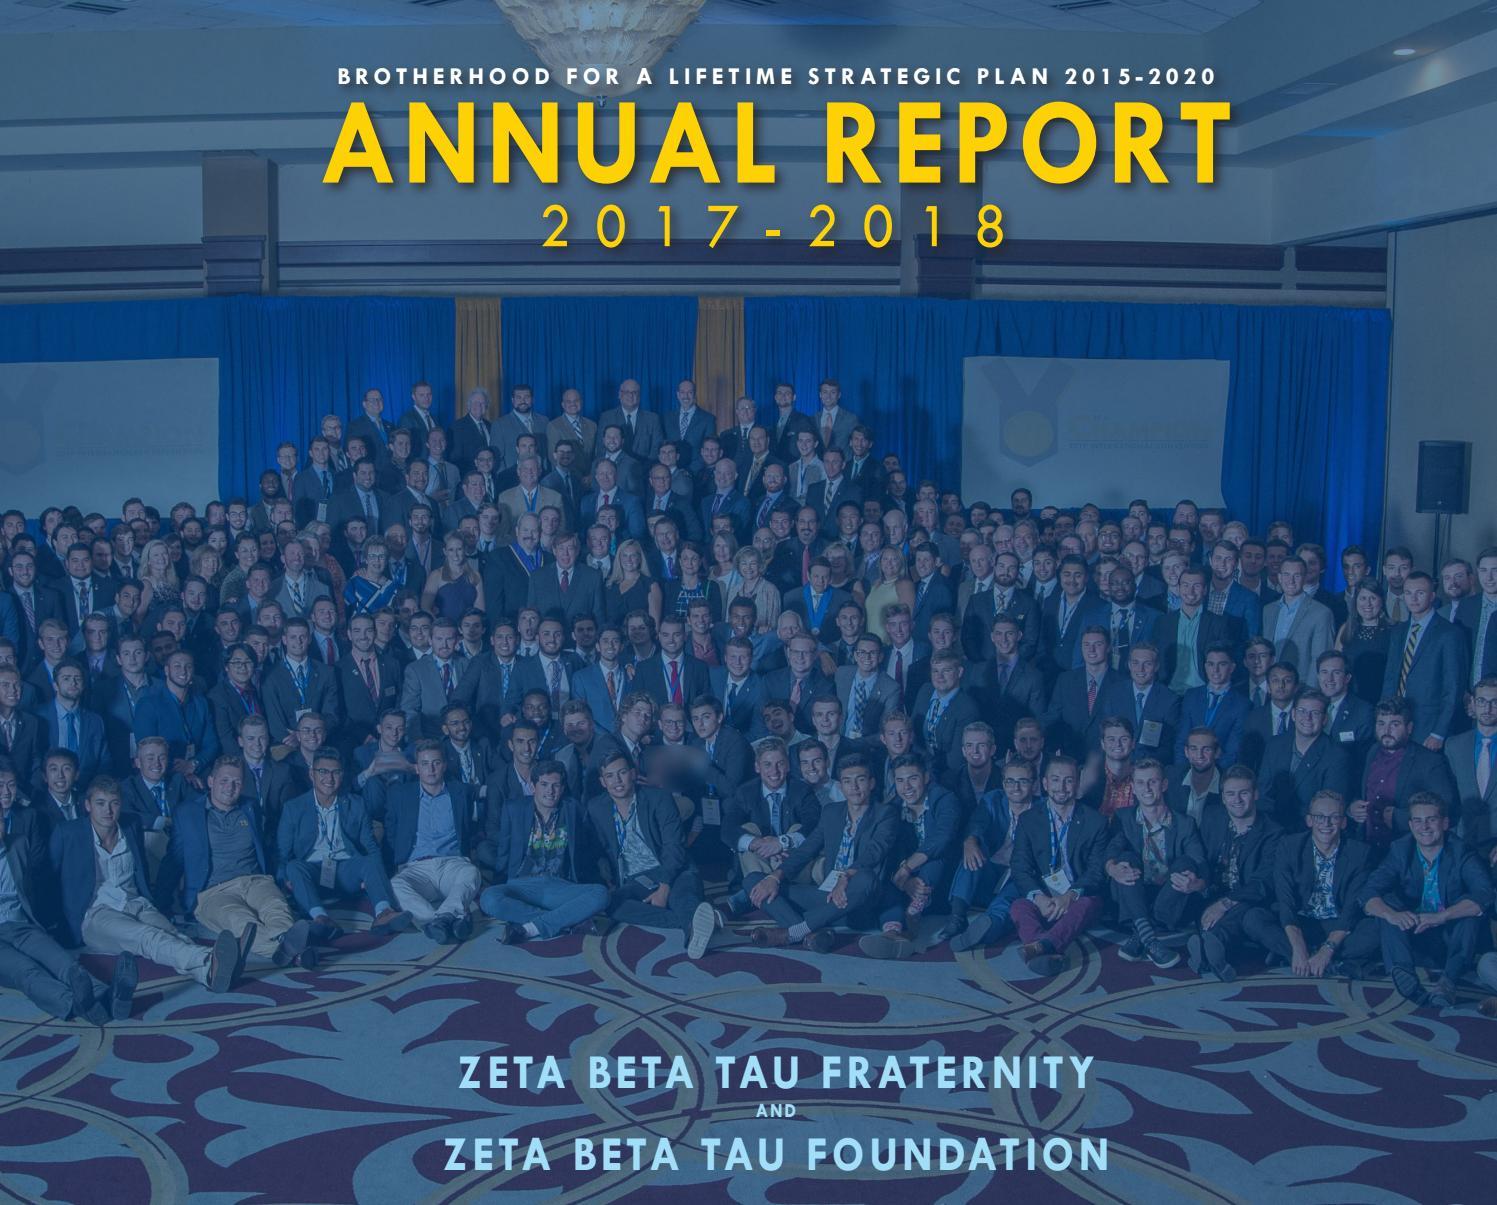 2017-2018 Annual Report by Zeta Beta Tau Fraternity - issuu